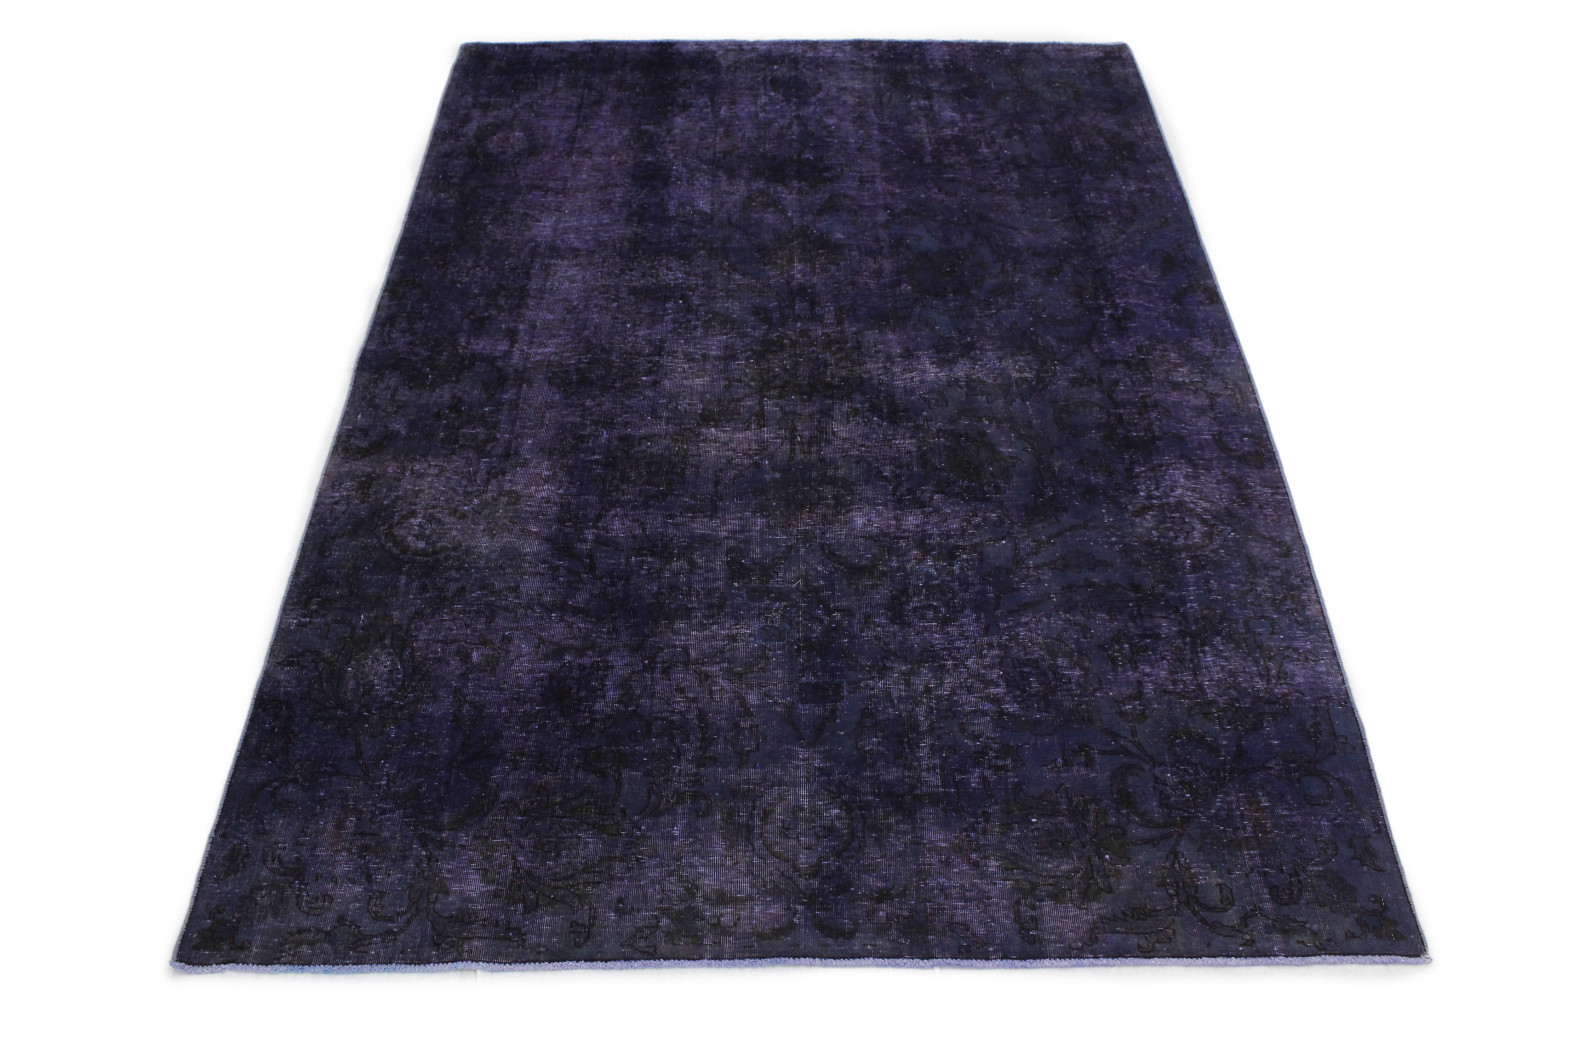 Vintage Teppich Lila in 300x200cm (1 / 5)